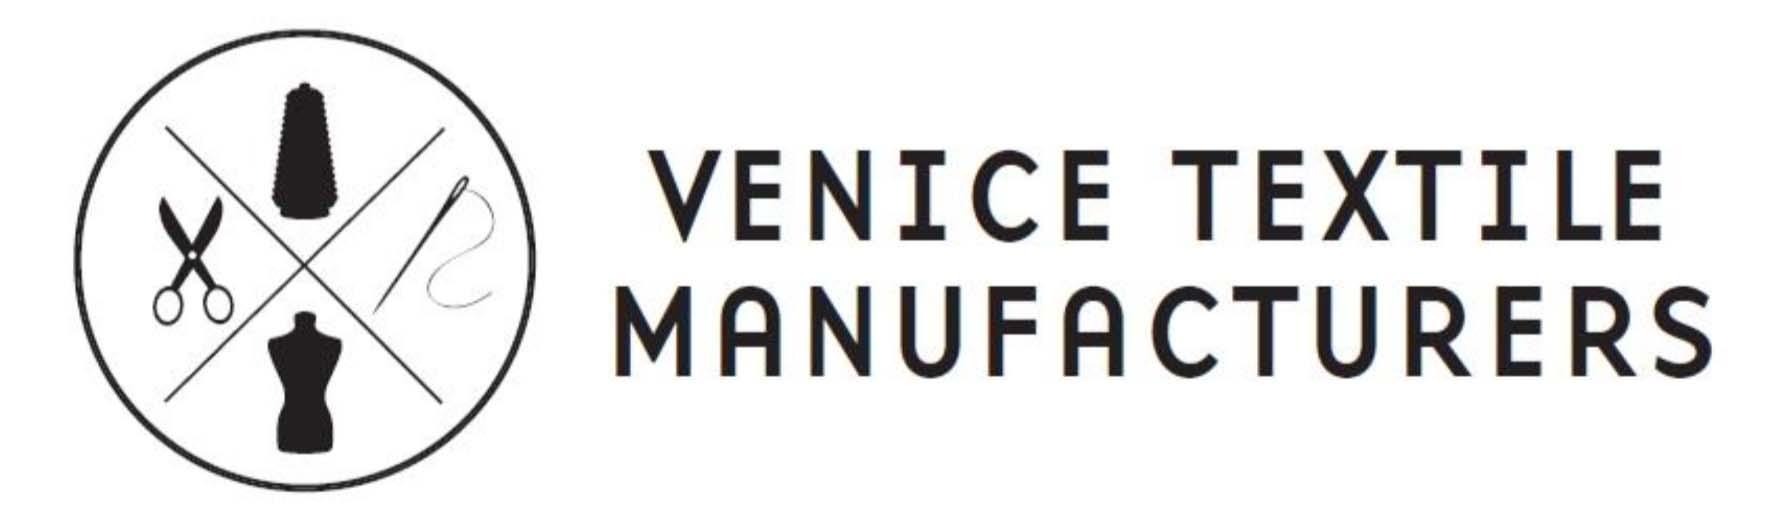 Venice Textile Manufacturers